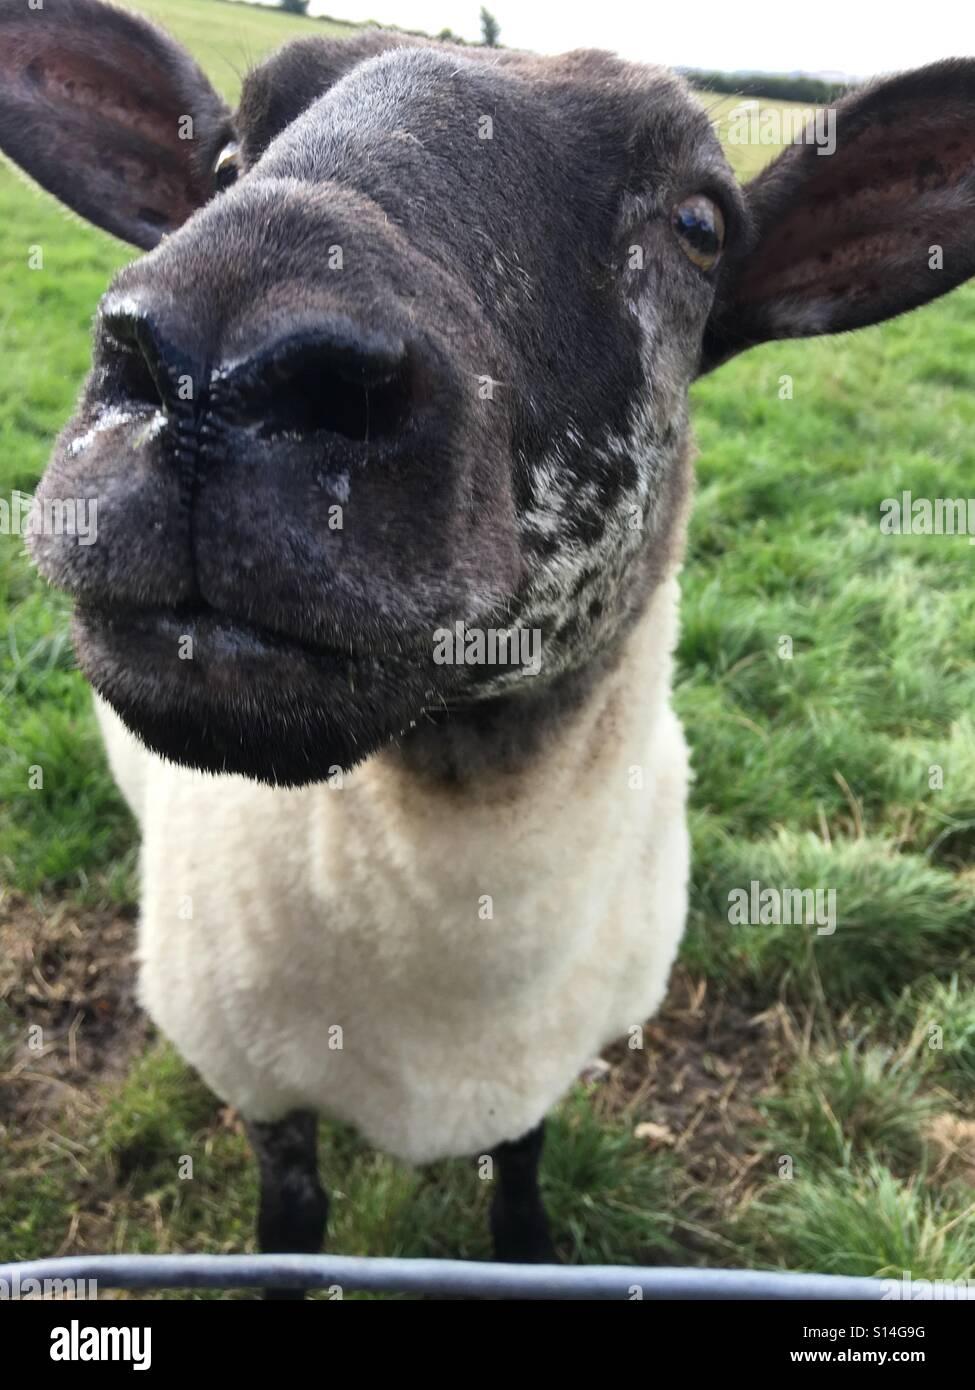 Runny nose Stock Photo: 310501900 - Alamy